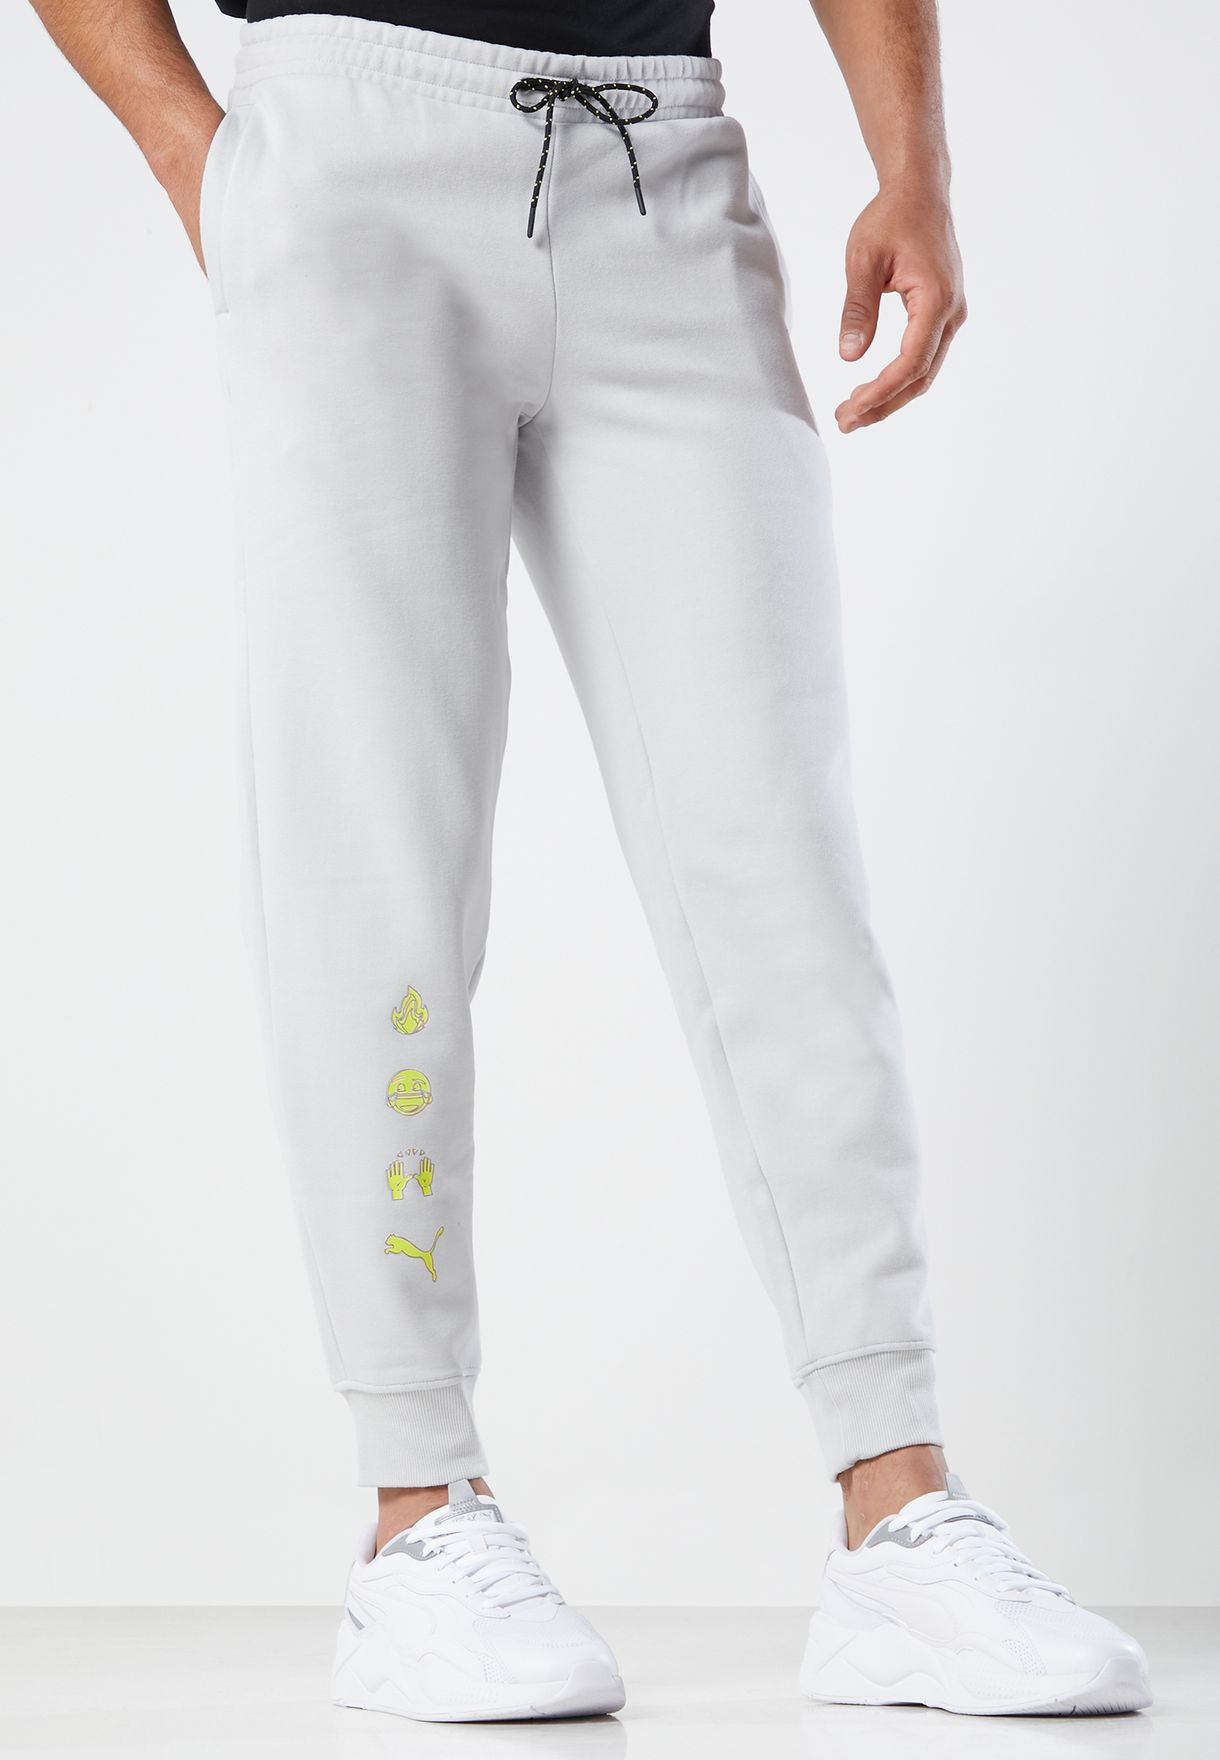 Emoji Sweatpants